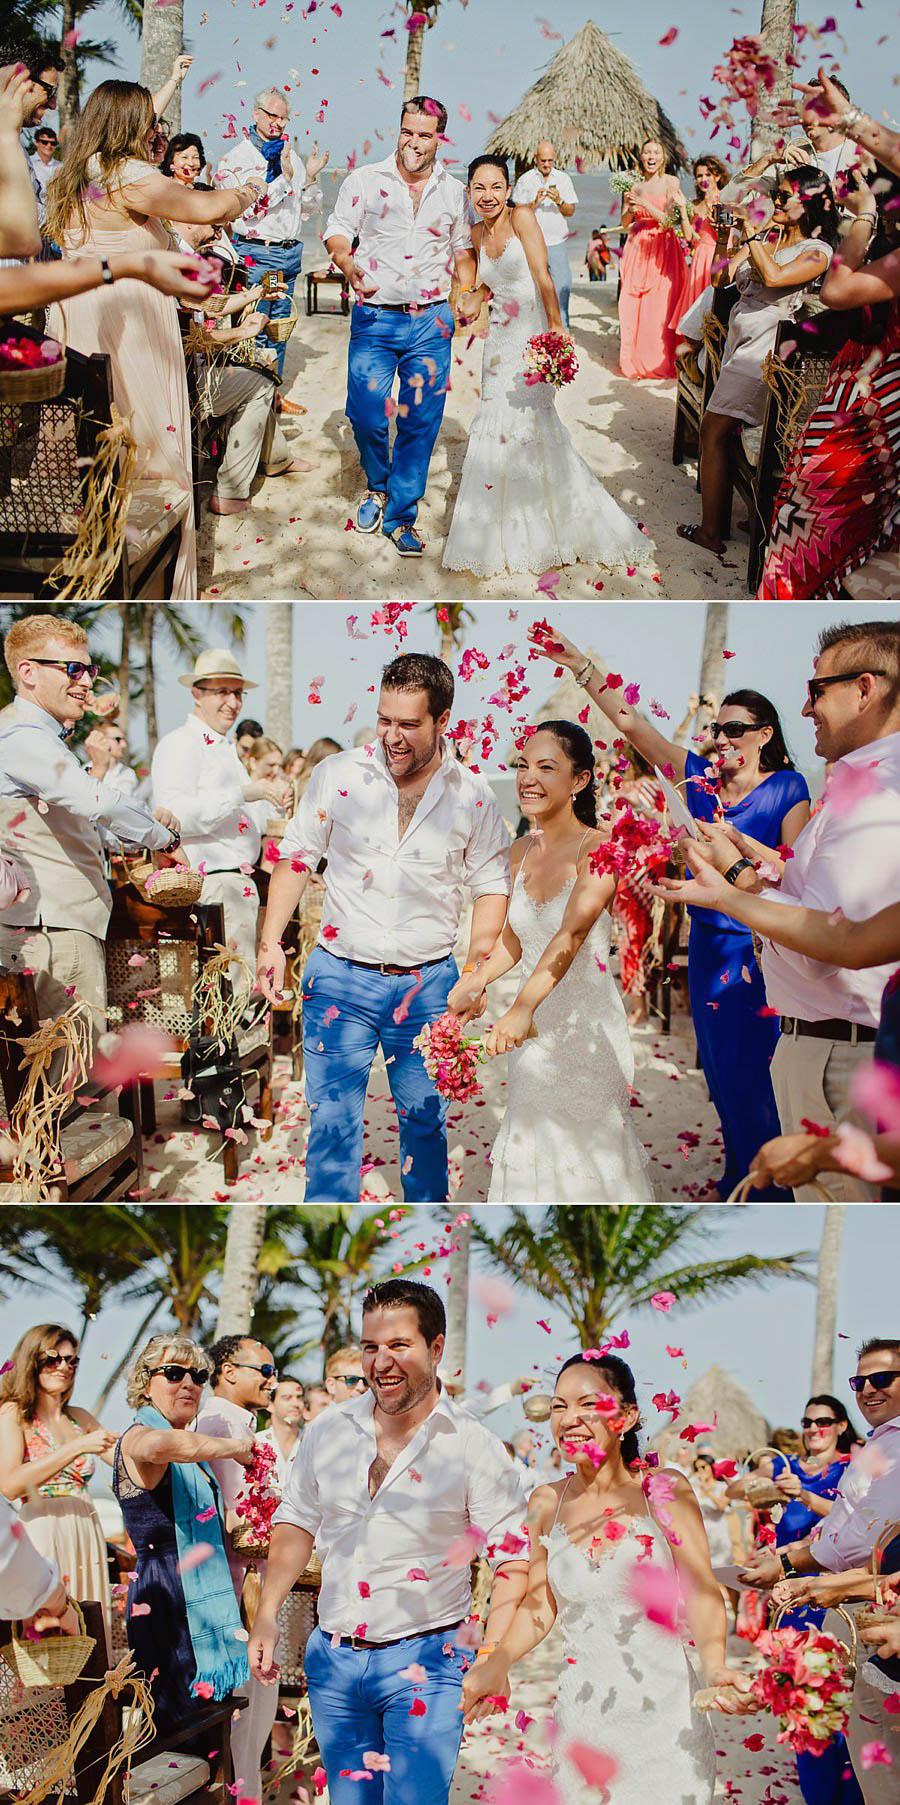 zanzibar_tanzania_kenya_malindi_beach_multicultural_wedding_photography_mamalovebabamarry_0014.jpg